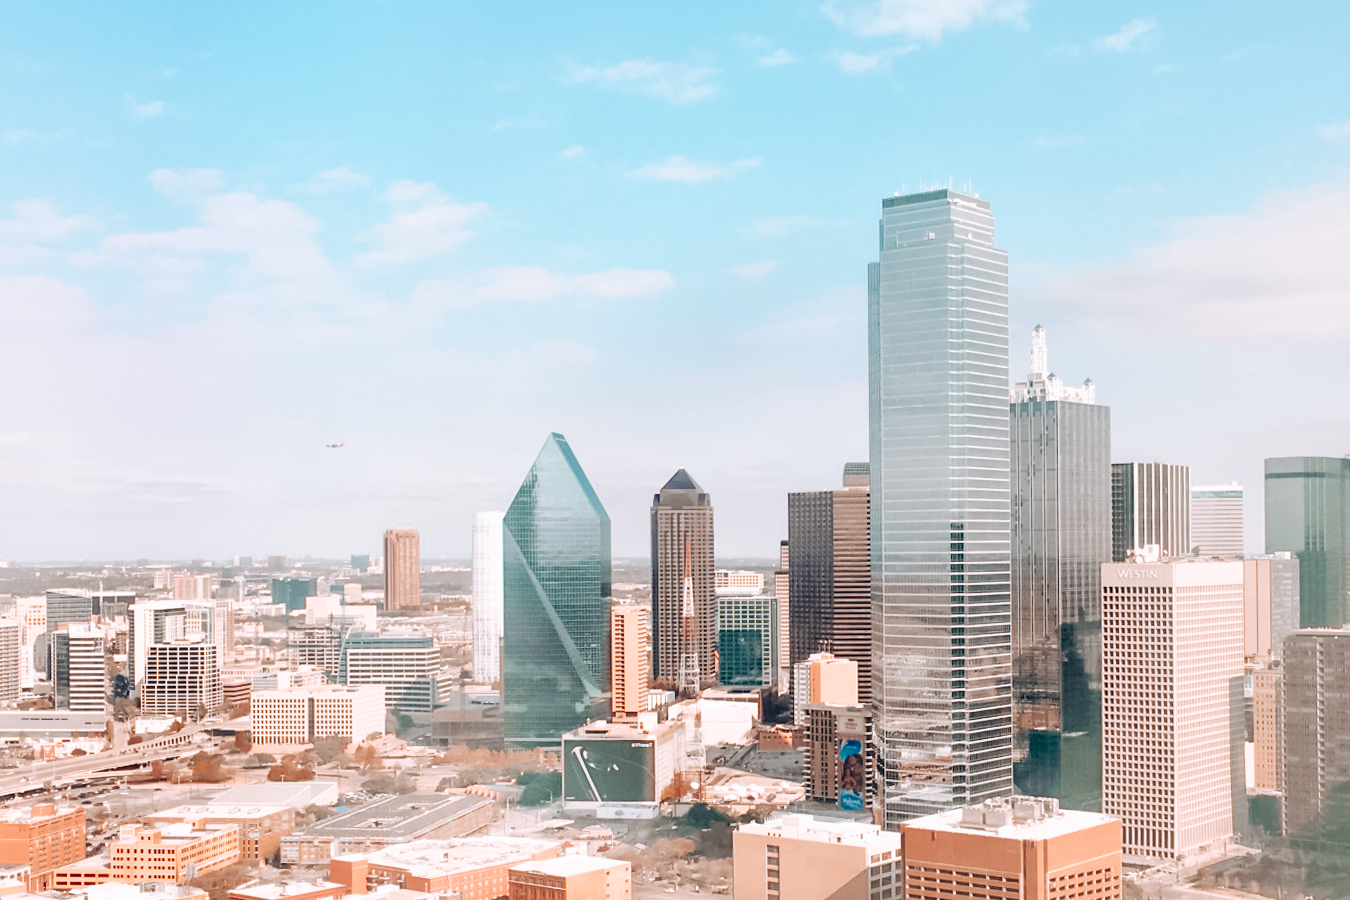 Buildings in the center of Dallas